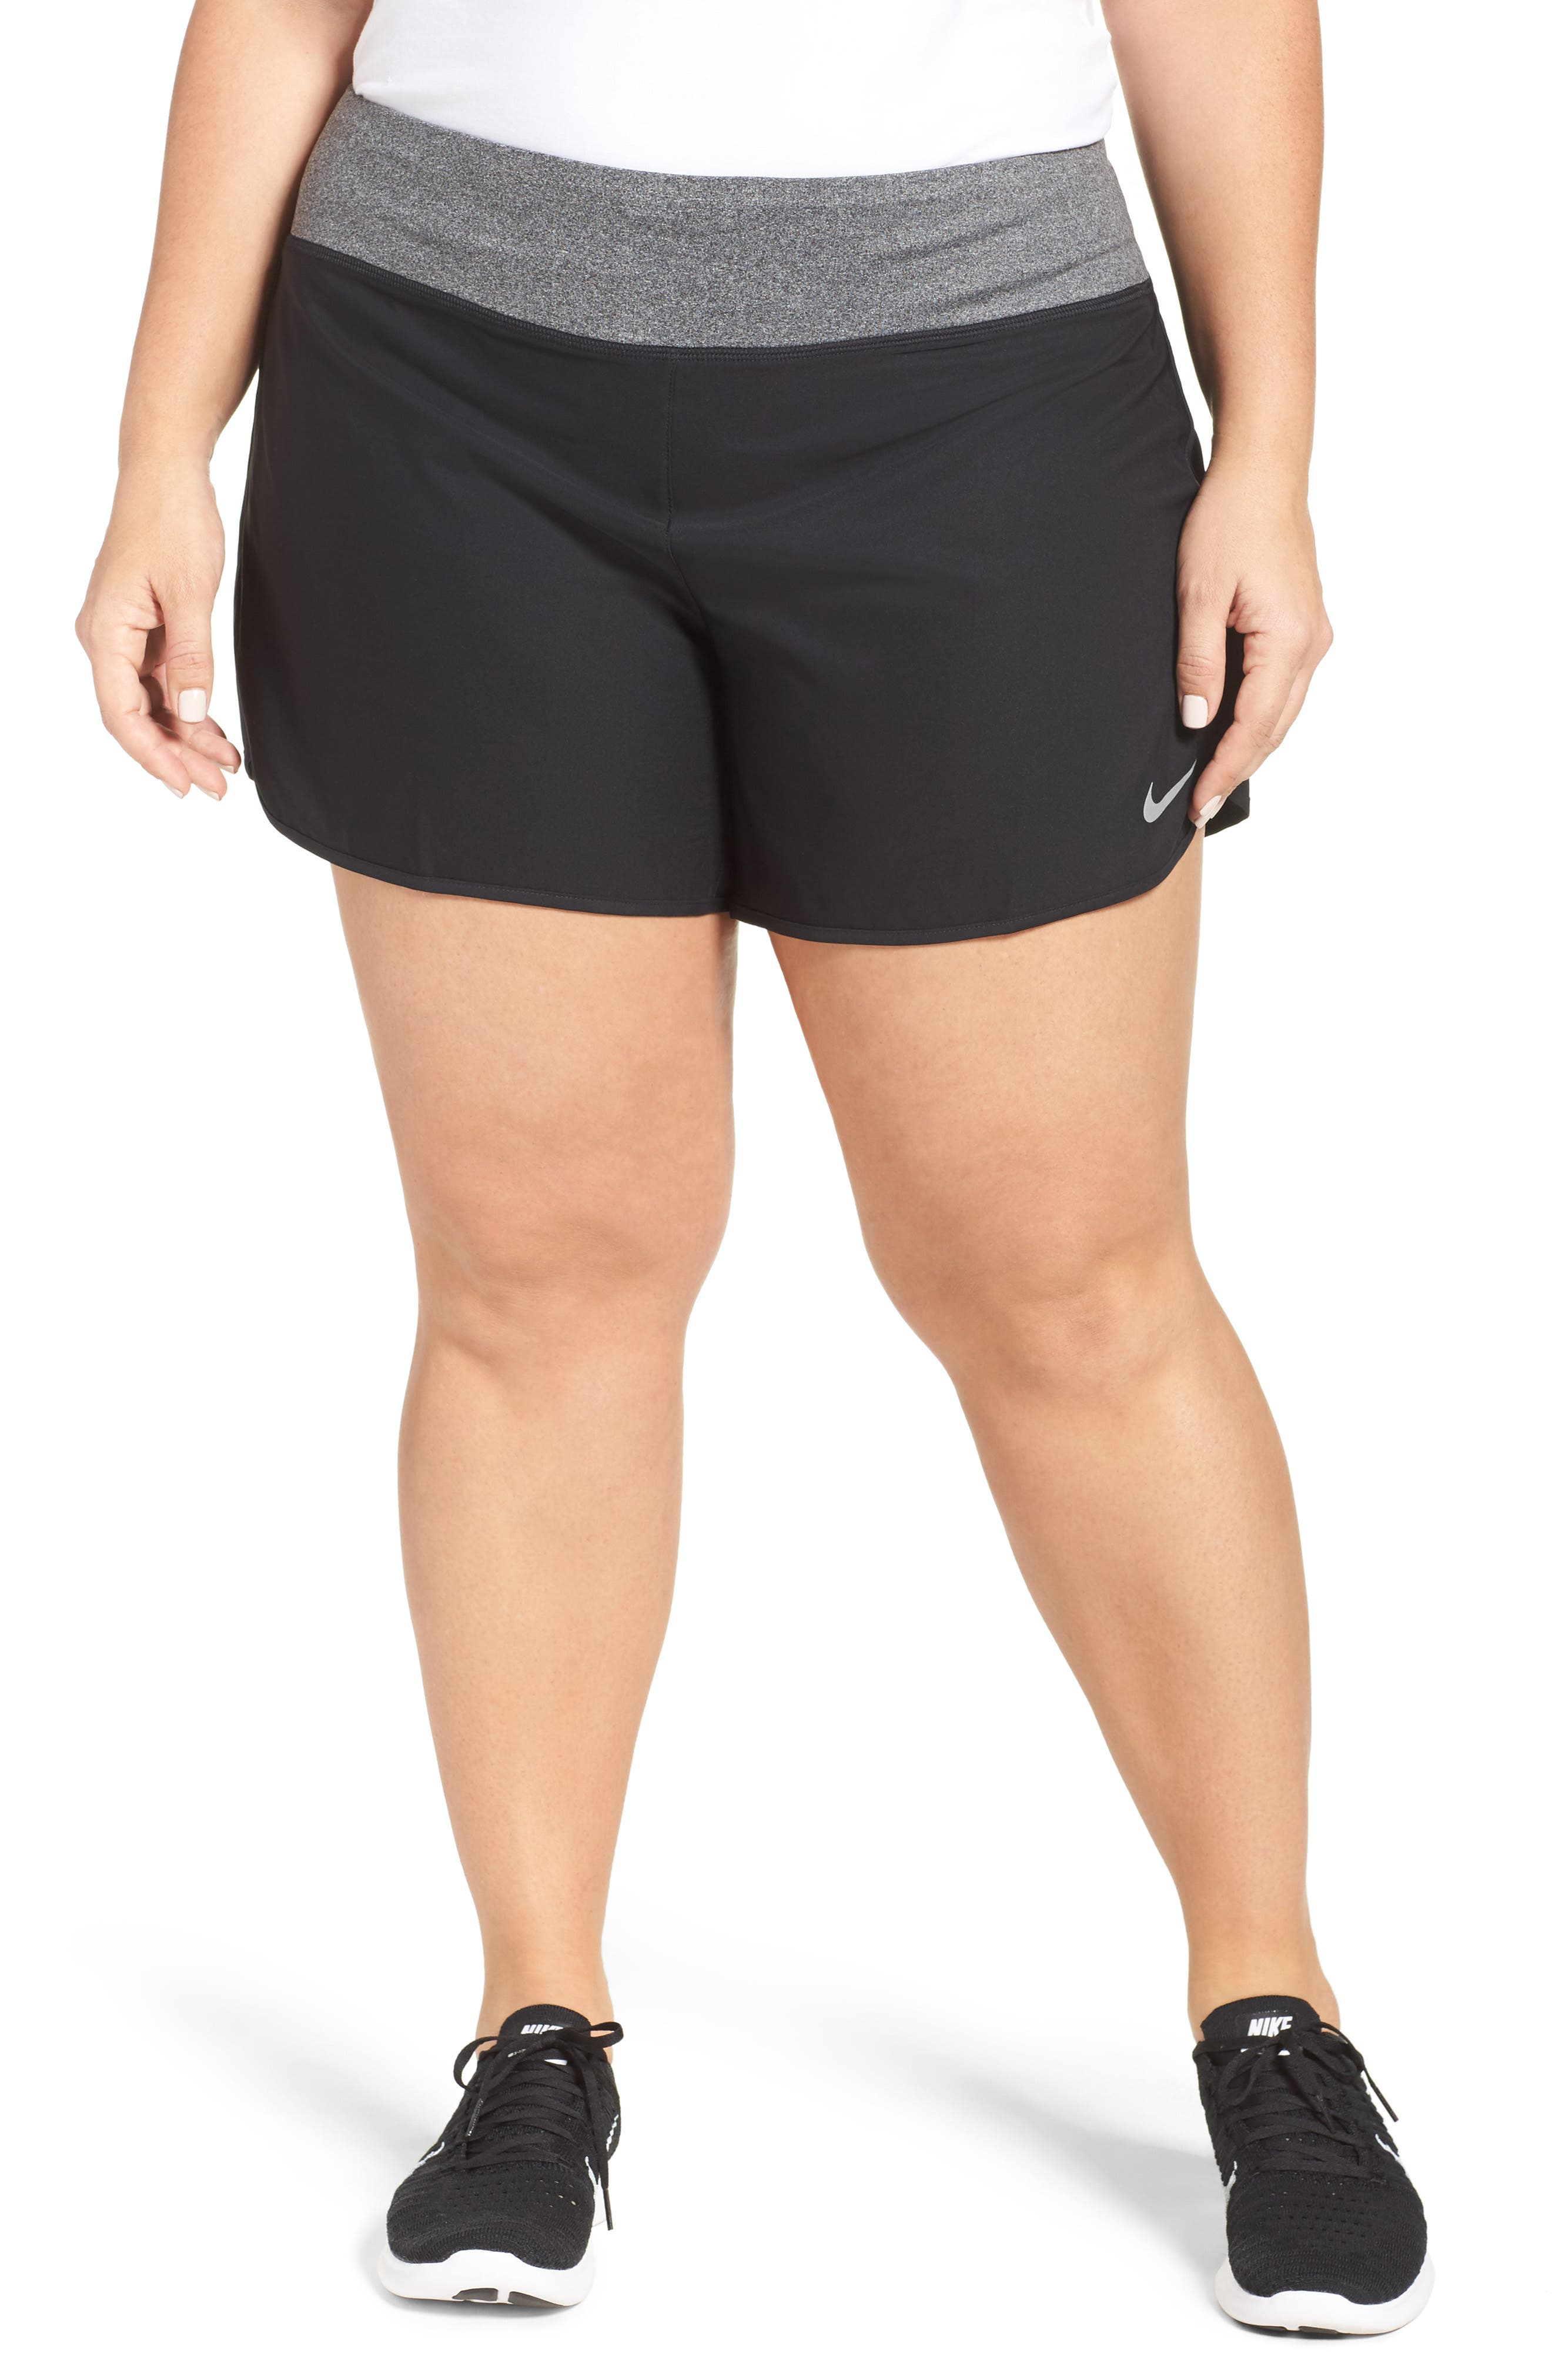 Alternate Image 1 Selected - Nike Rival Running Shorts (Plus Size)